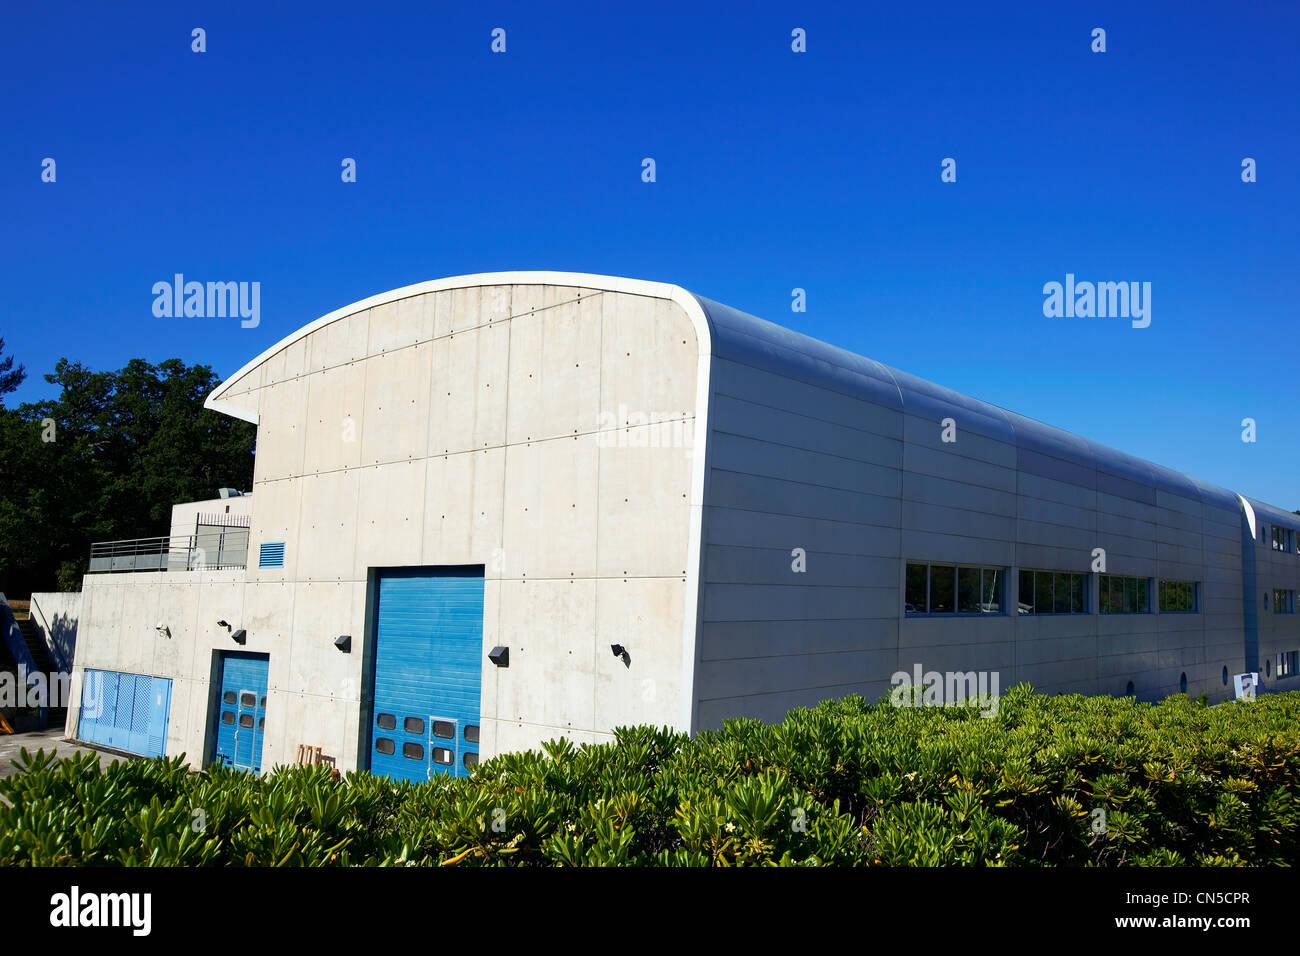 France, Bouches du Rhone, Marseille, 9th district, the Technopole de Luminy, Centre for Particle Physics of Marseille - Stock Image